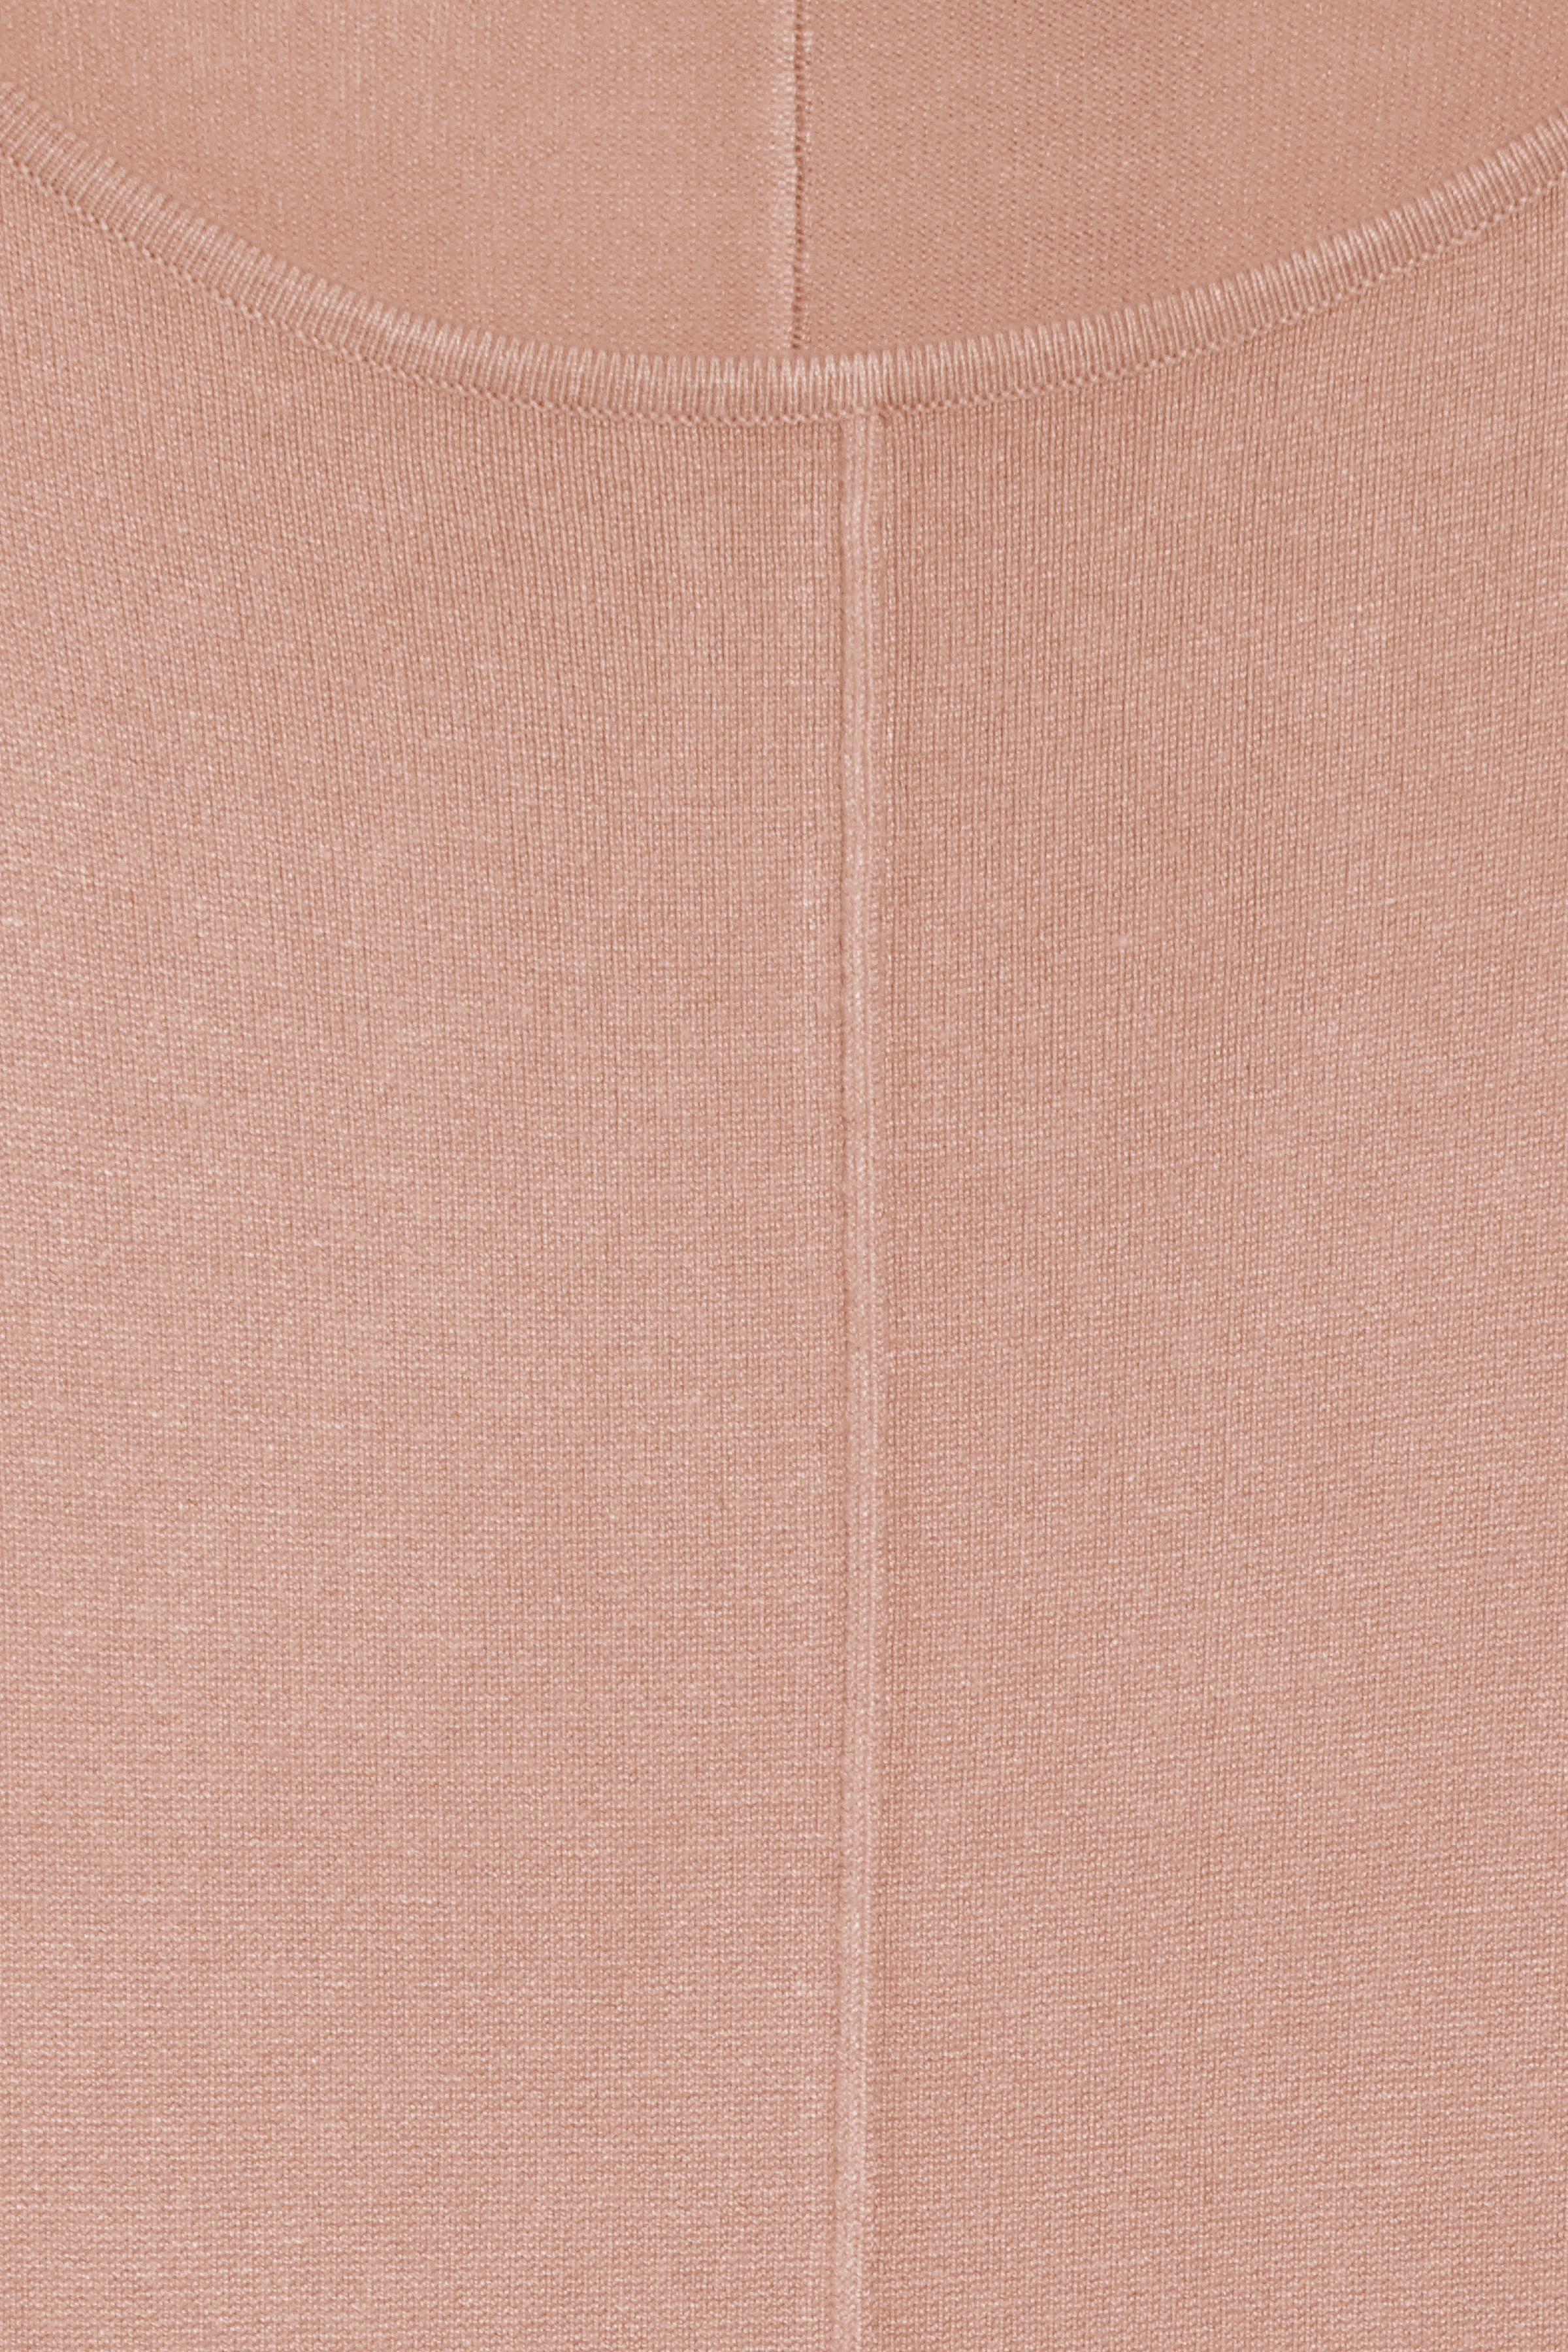 MEL. Rose Cloud Pullover van b.young – Koop MEL. Rose Cloud Pullover hier van size XS-XXL